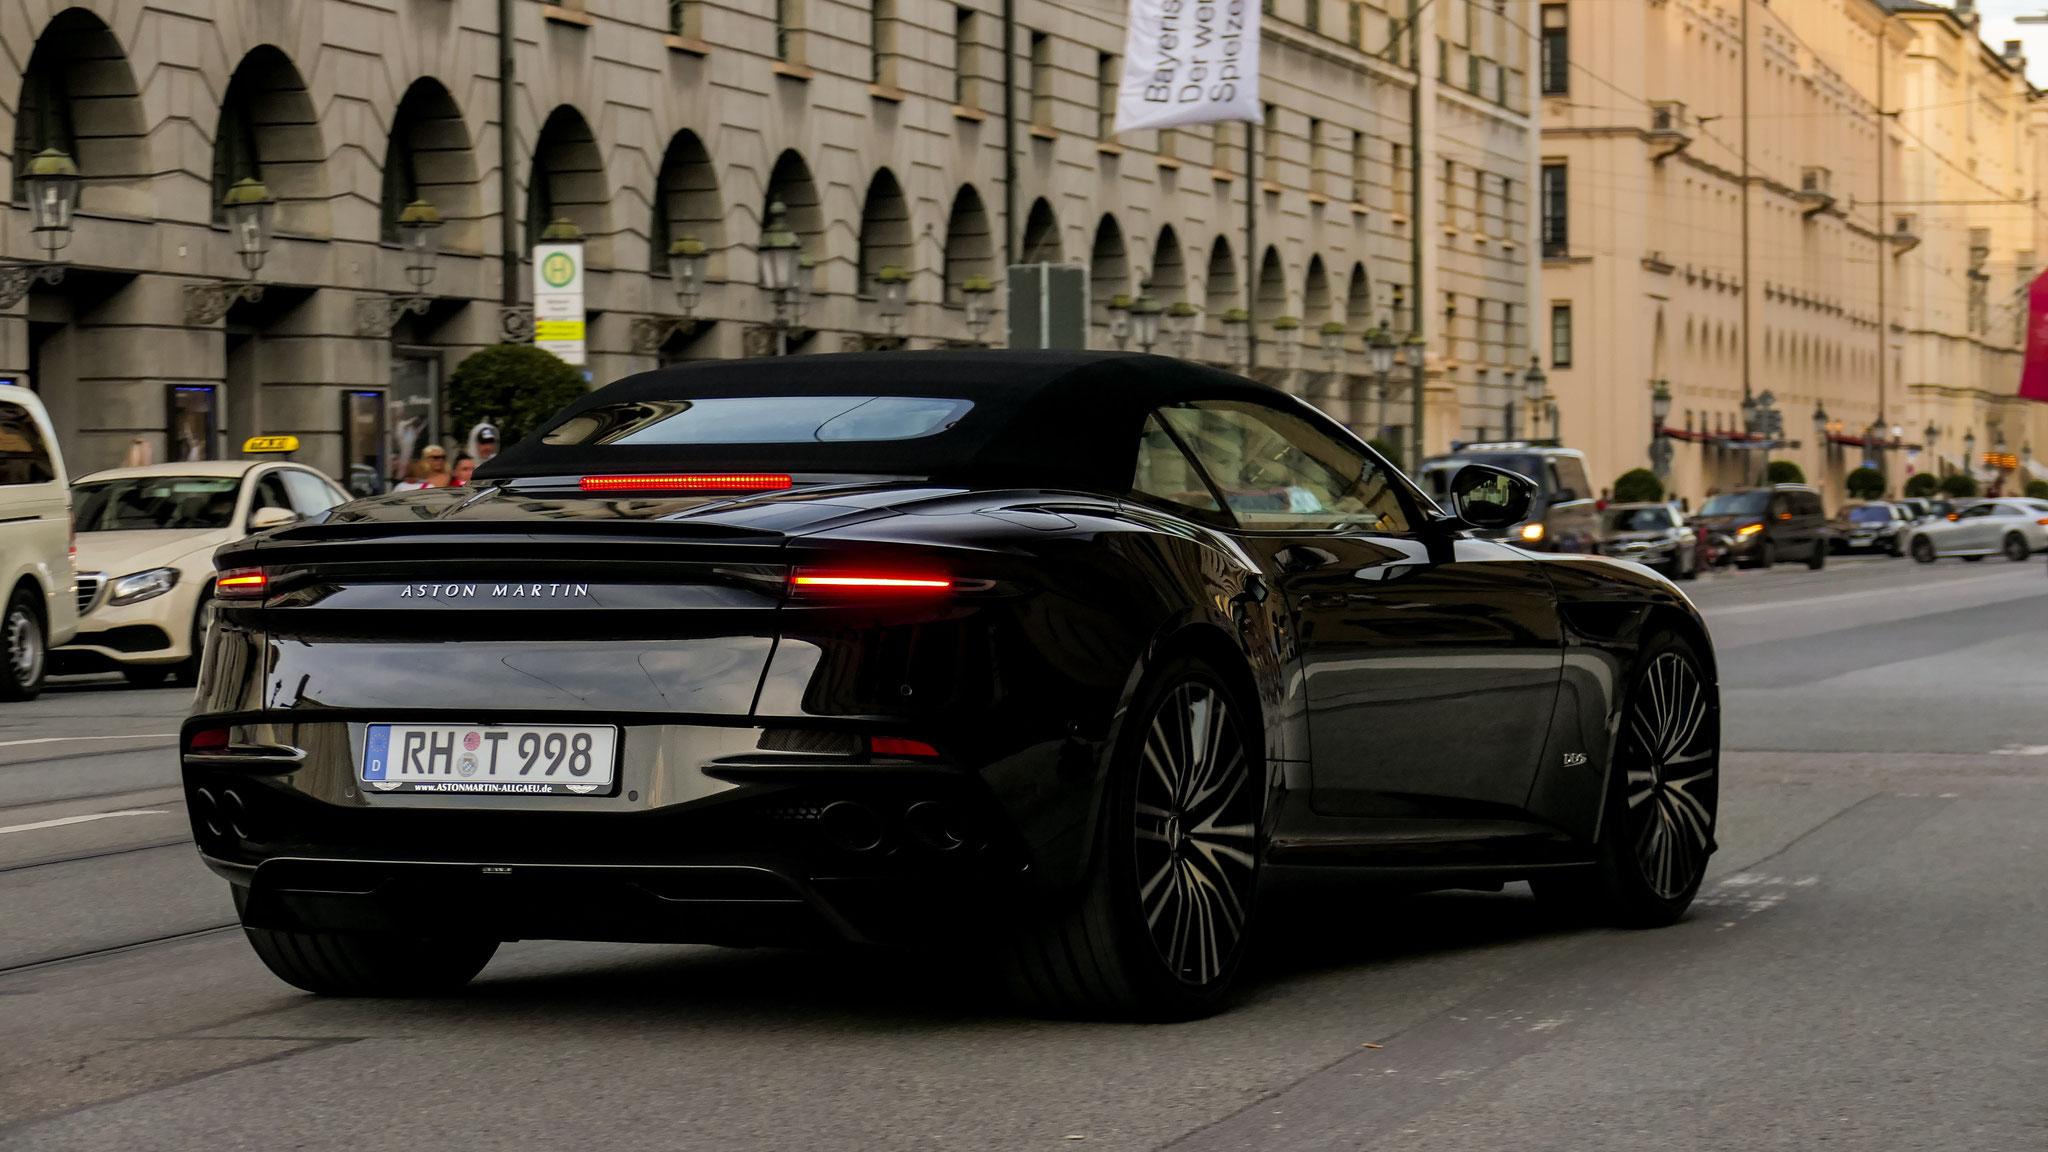 Aston Martin DBS Superleggera Volante - RH-T-998